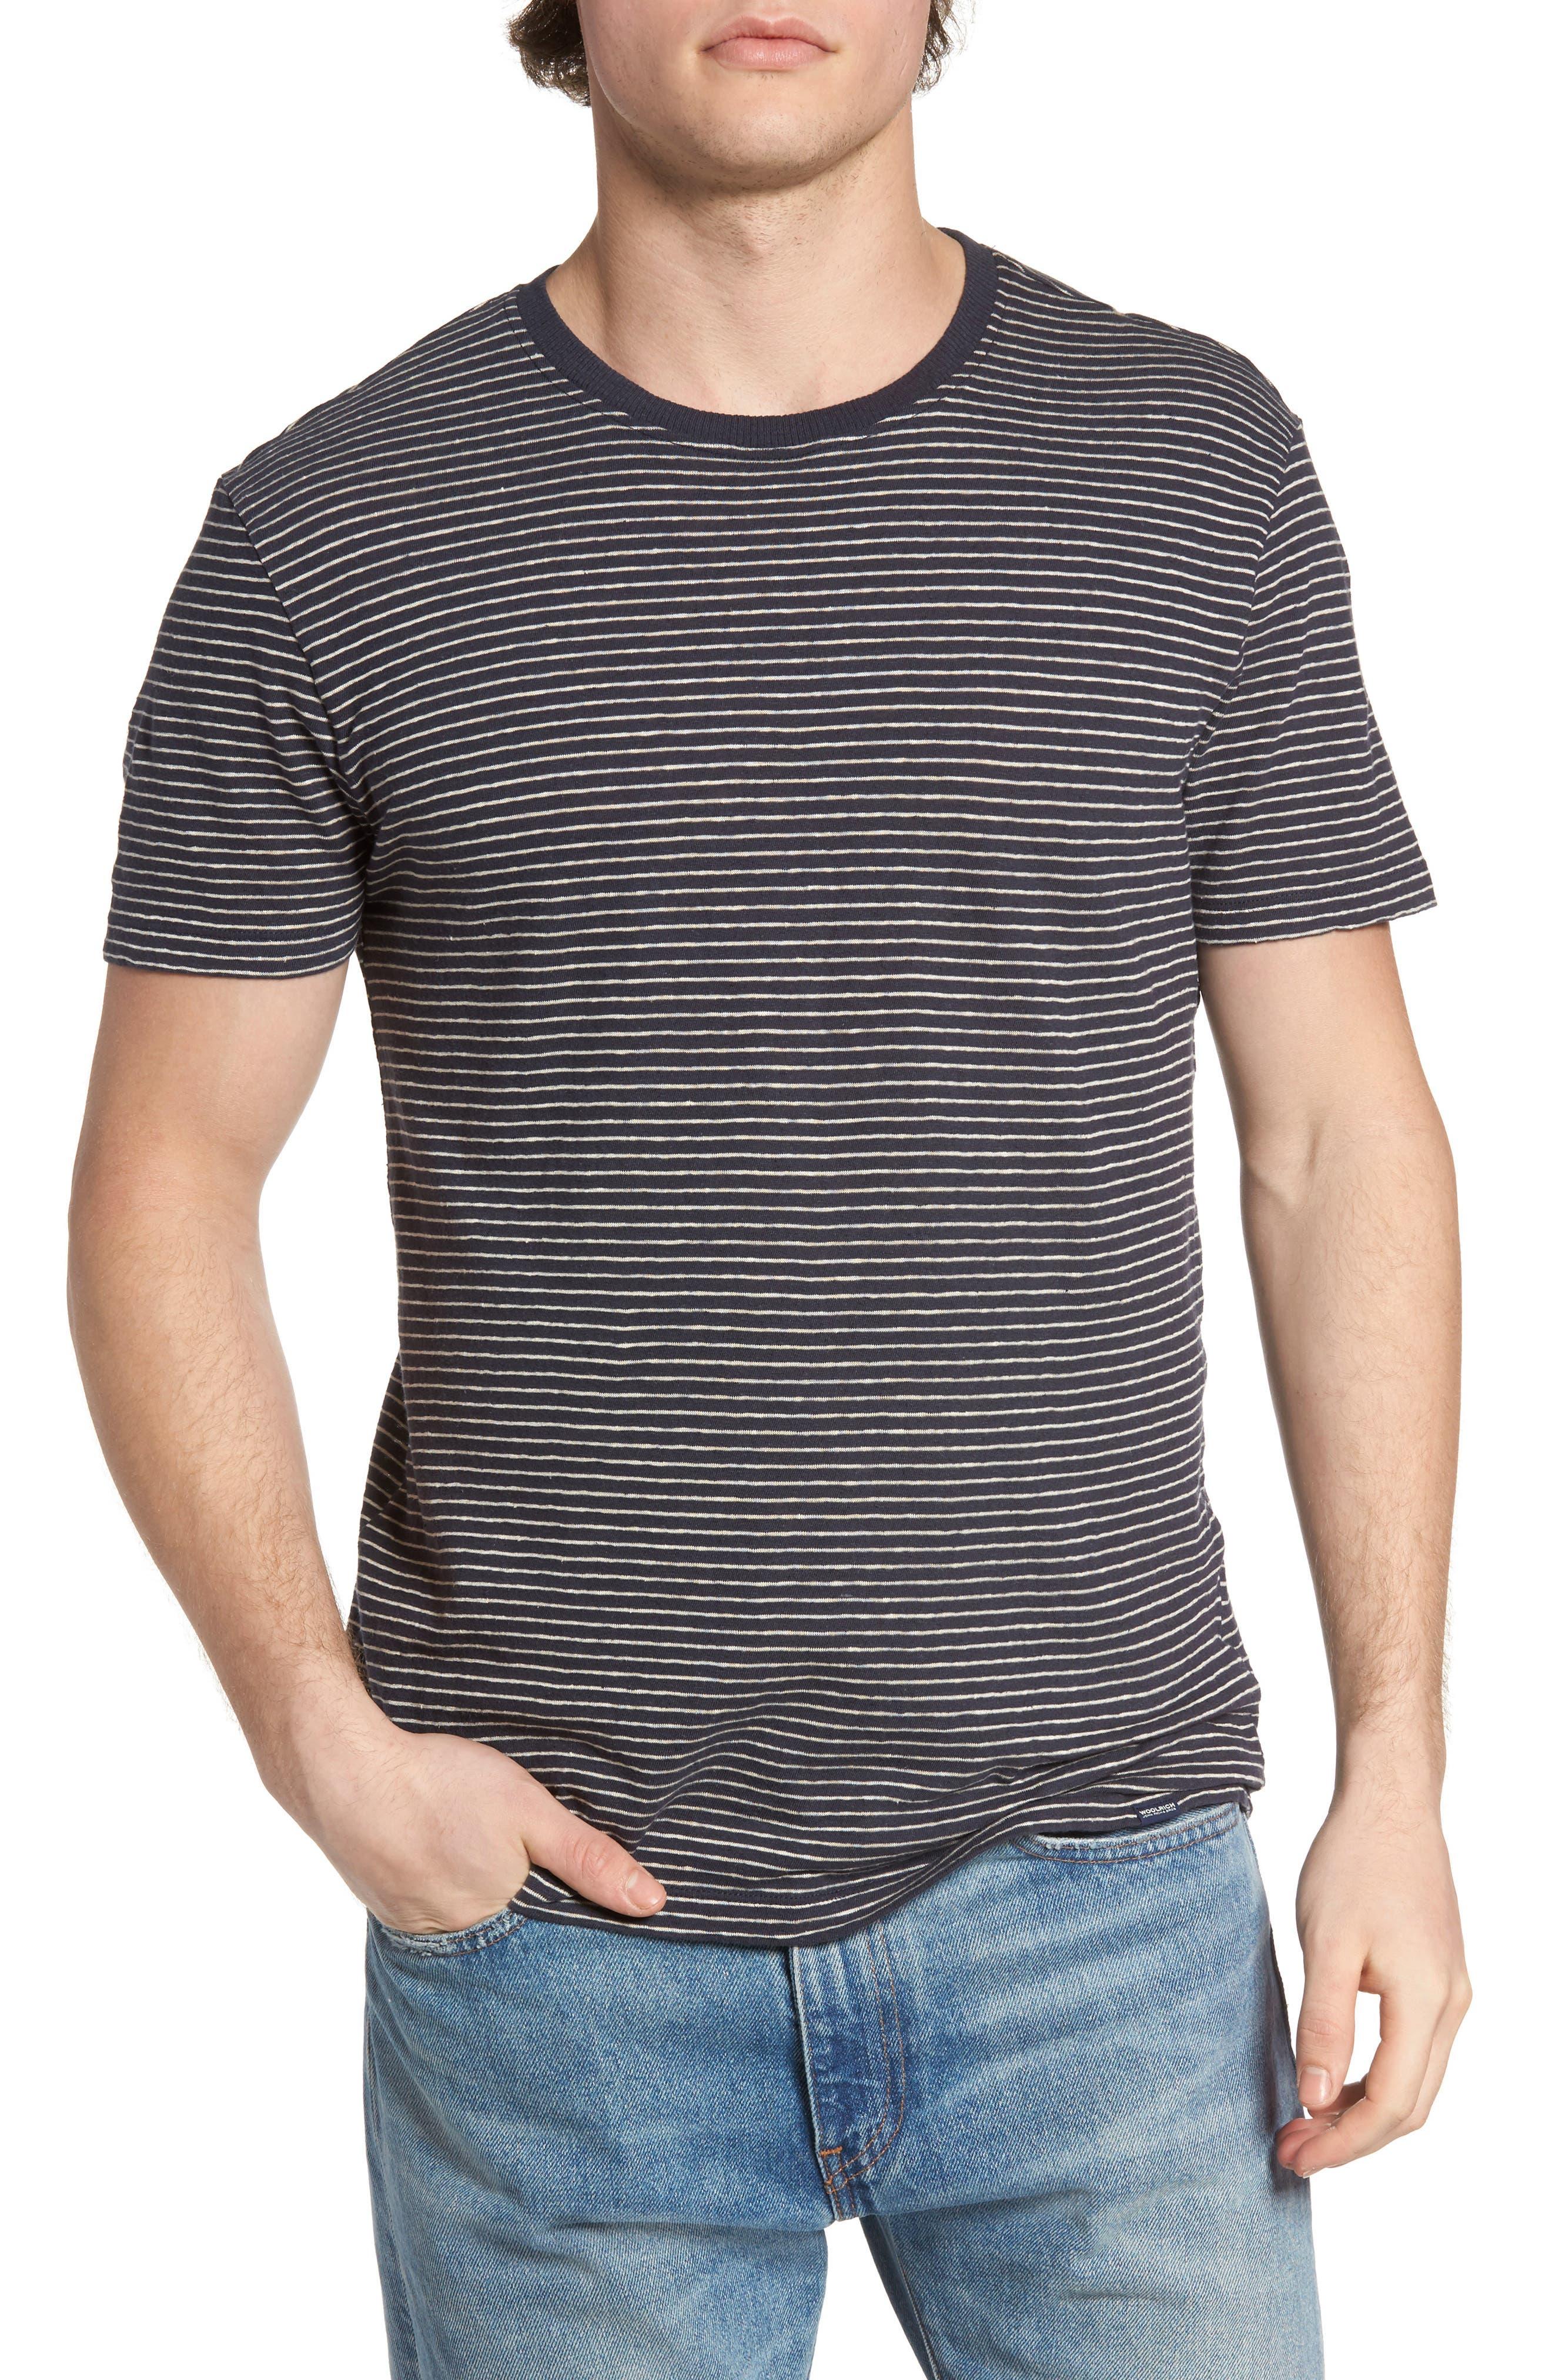 John Rich Stripe Cotton & Linen T-Shirt,                             Main thumbnail 1, color,                             Dark Navy Stripe B